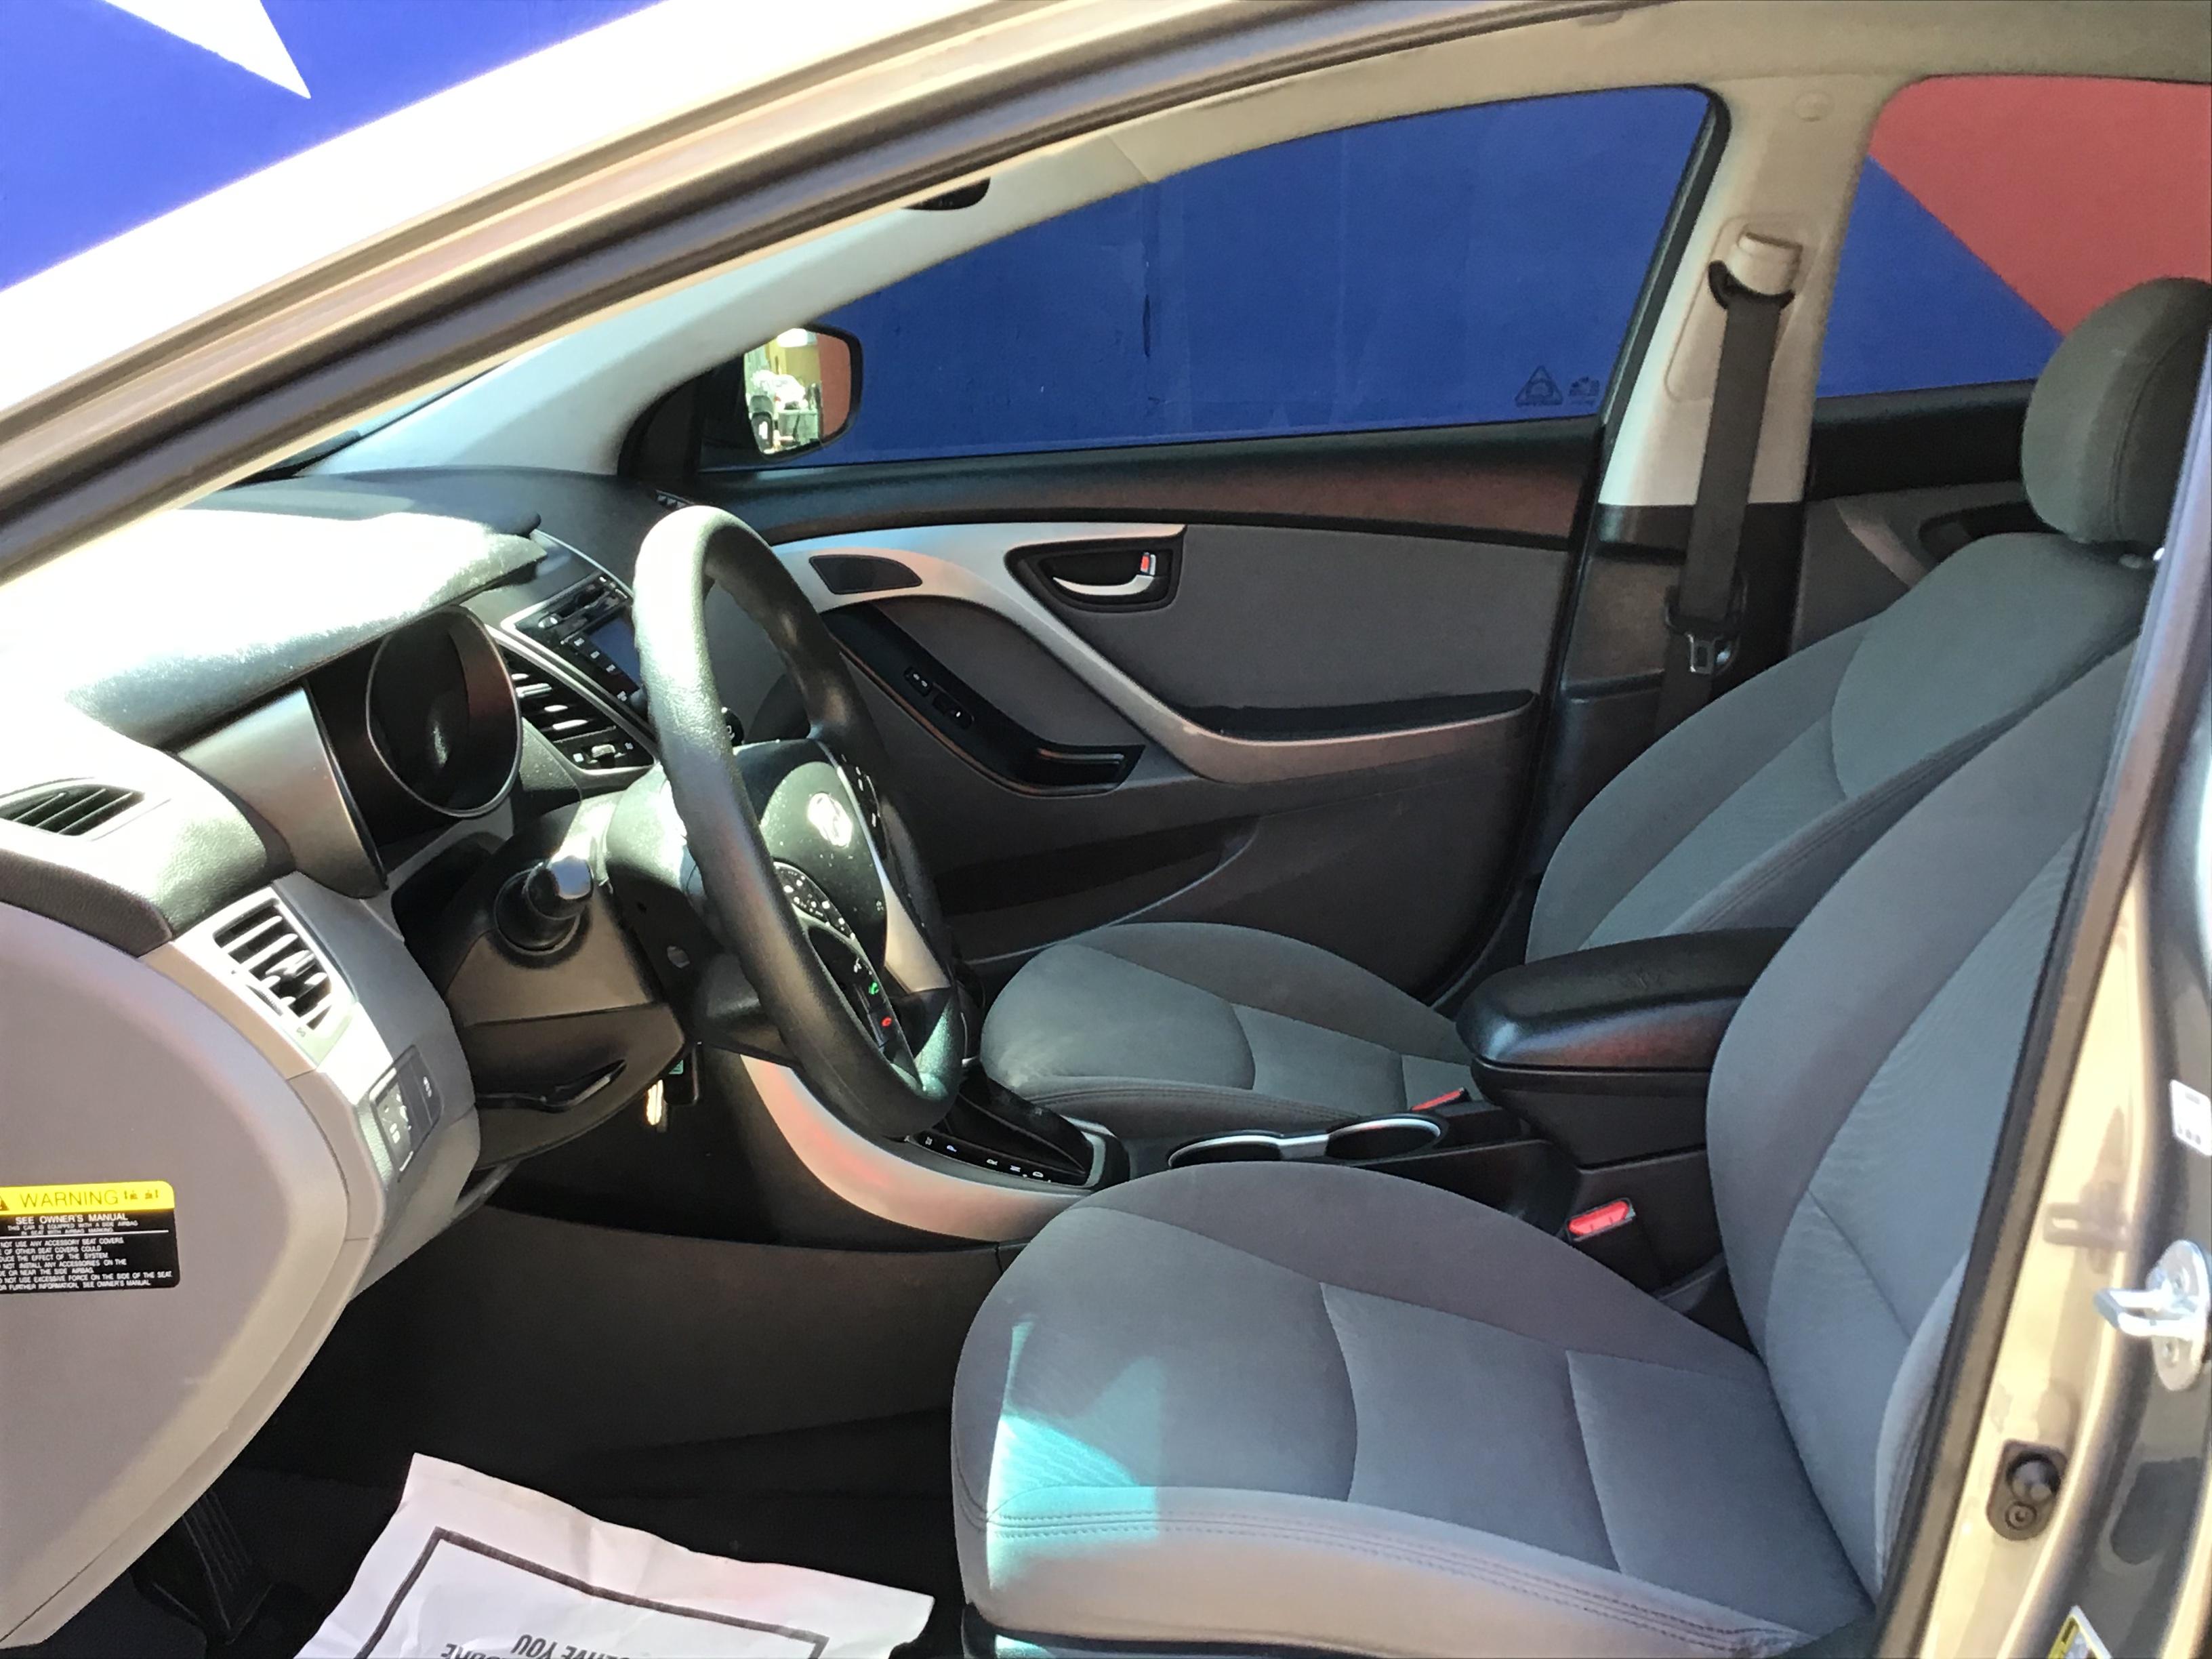 used vehicle - Sedan HYUNDAI ELANTRA 2014